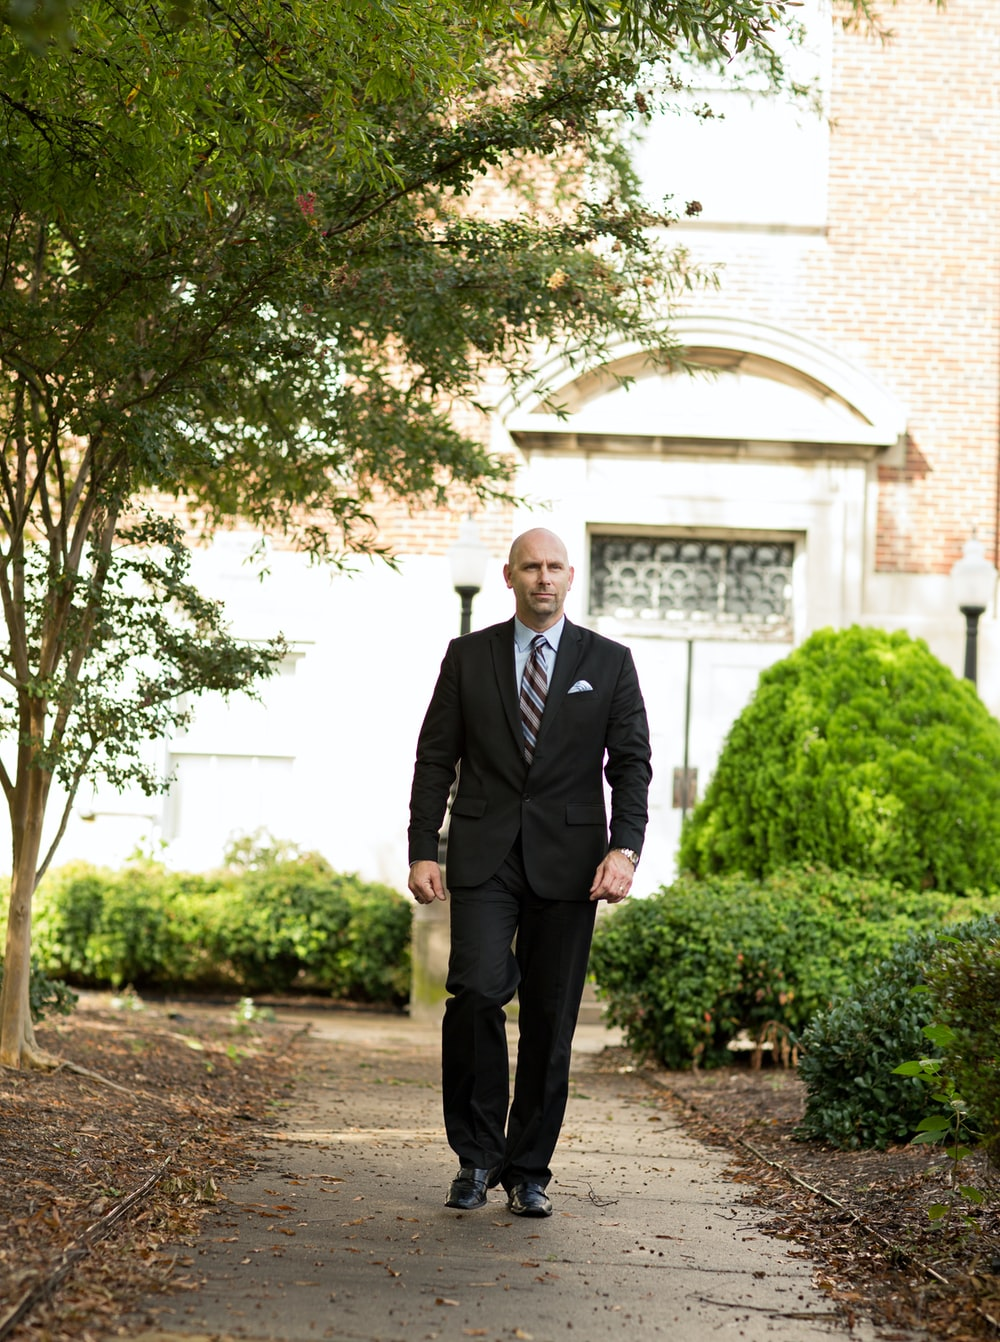 man standing on pavement